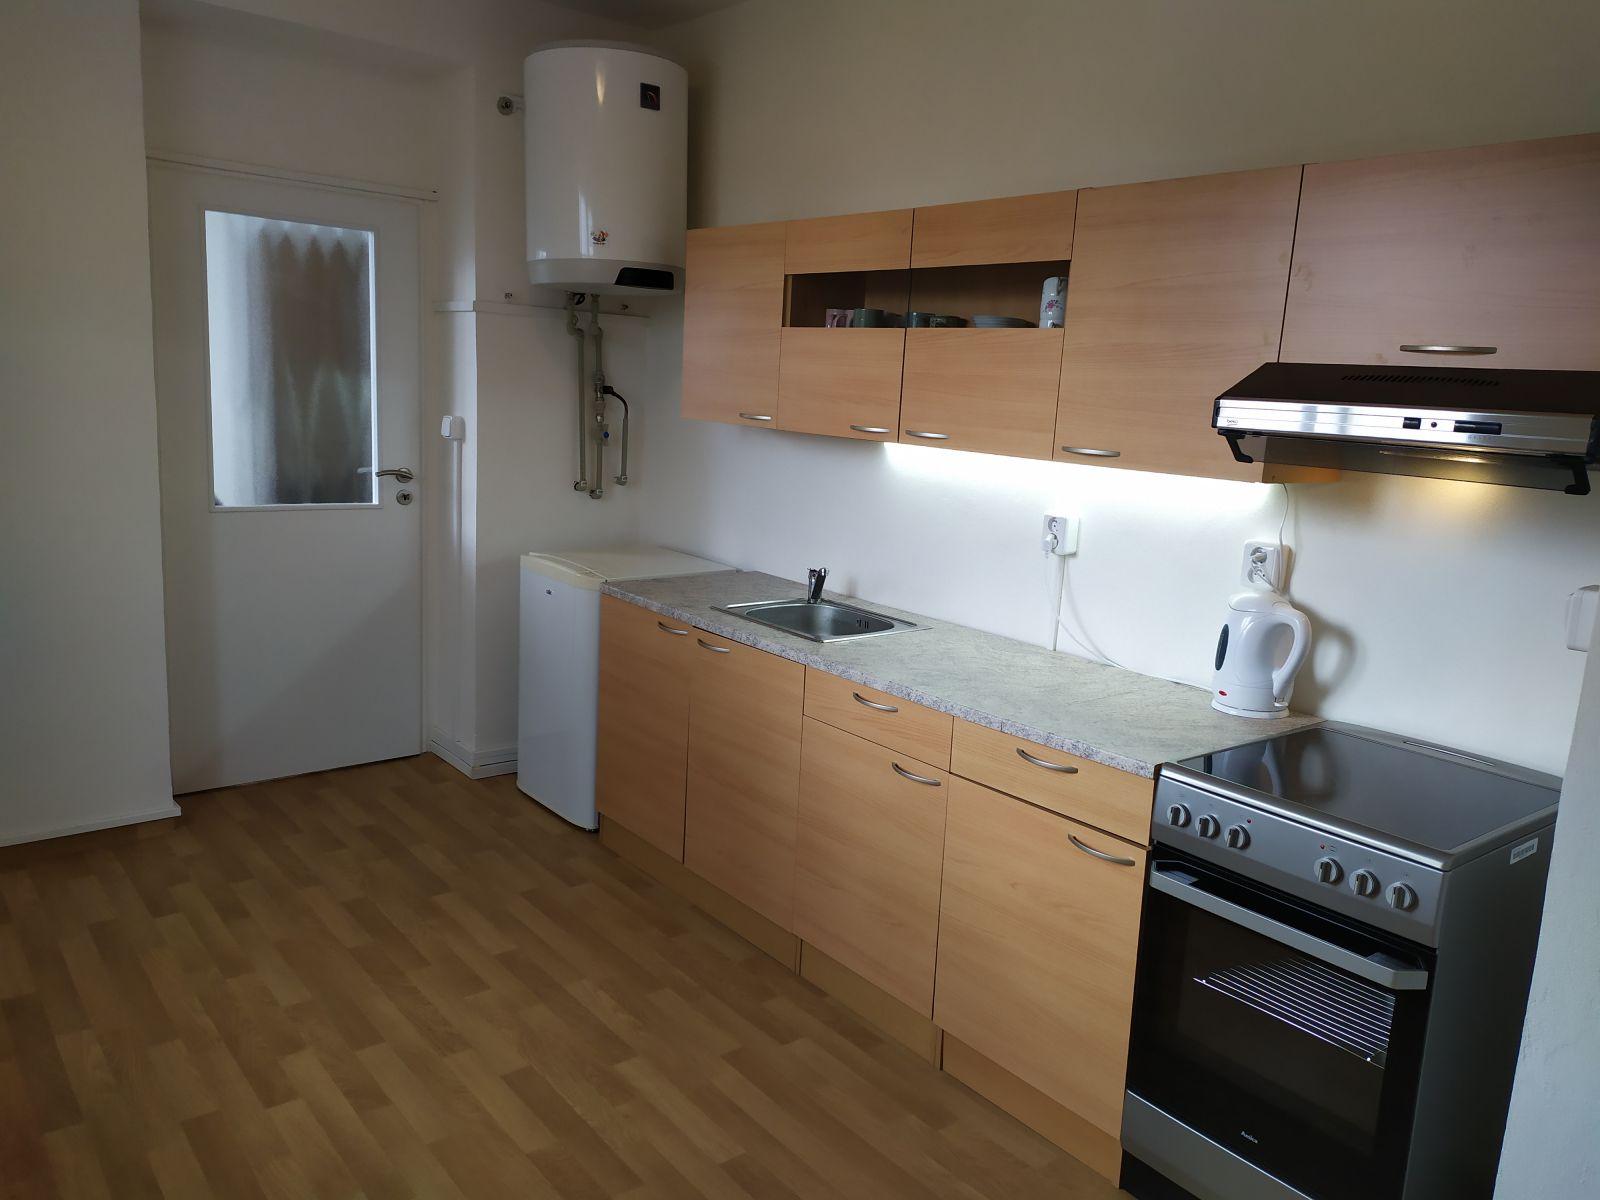 Pronájem krásného bytu 1+1/B, 49 m2 v obci Doubek, okres Praha východ